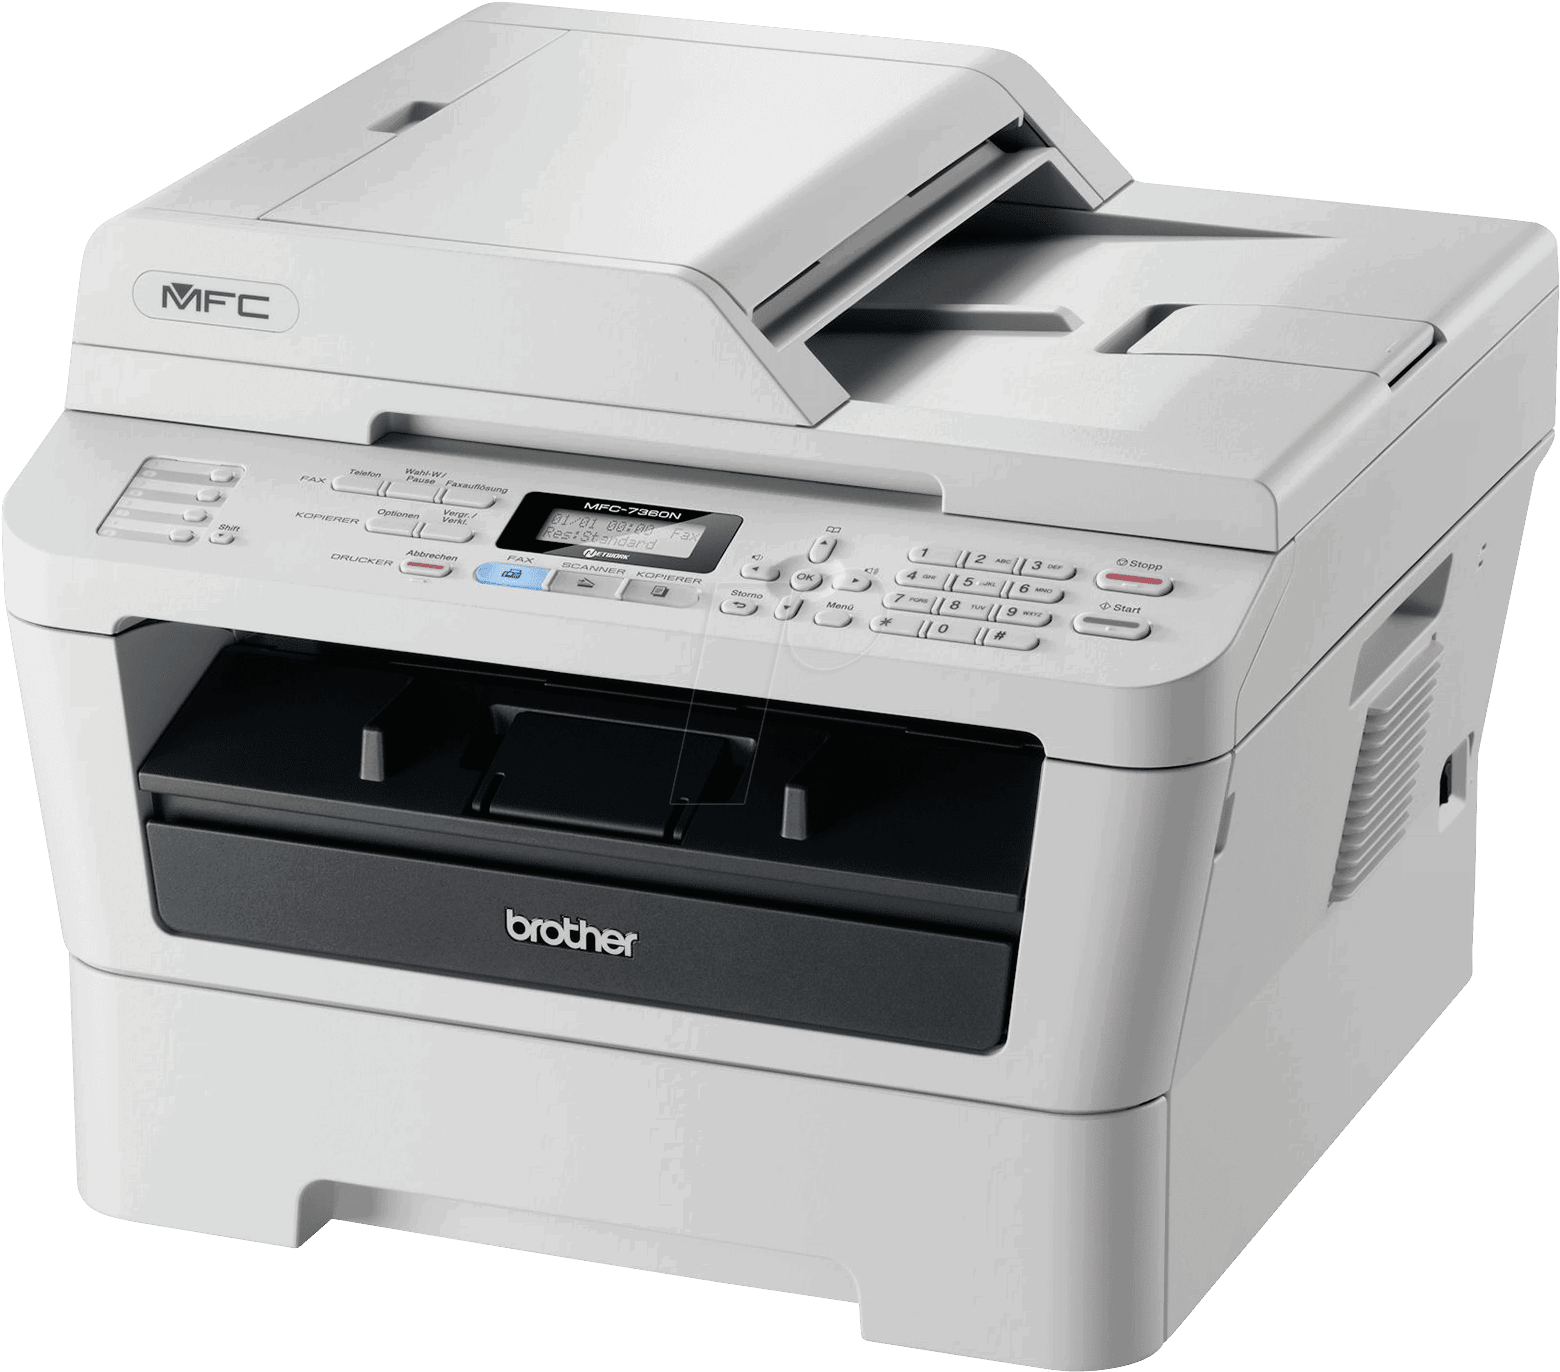 Serwis drukarek laserowych